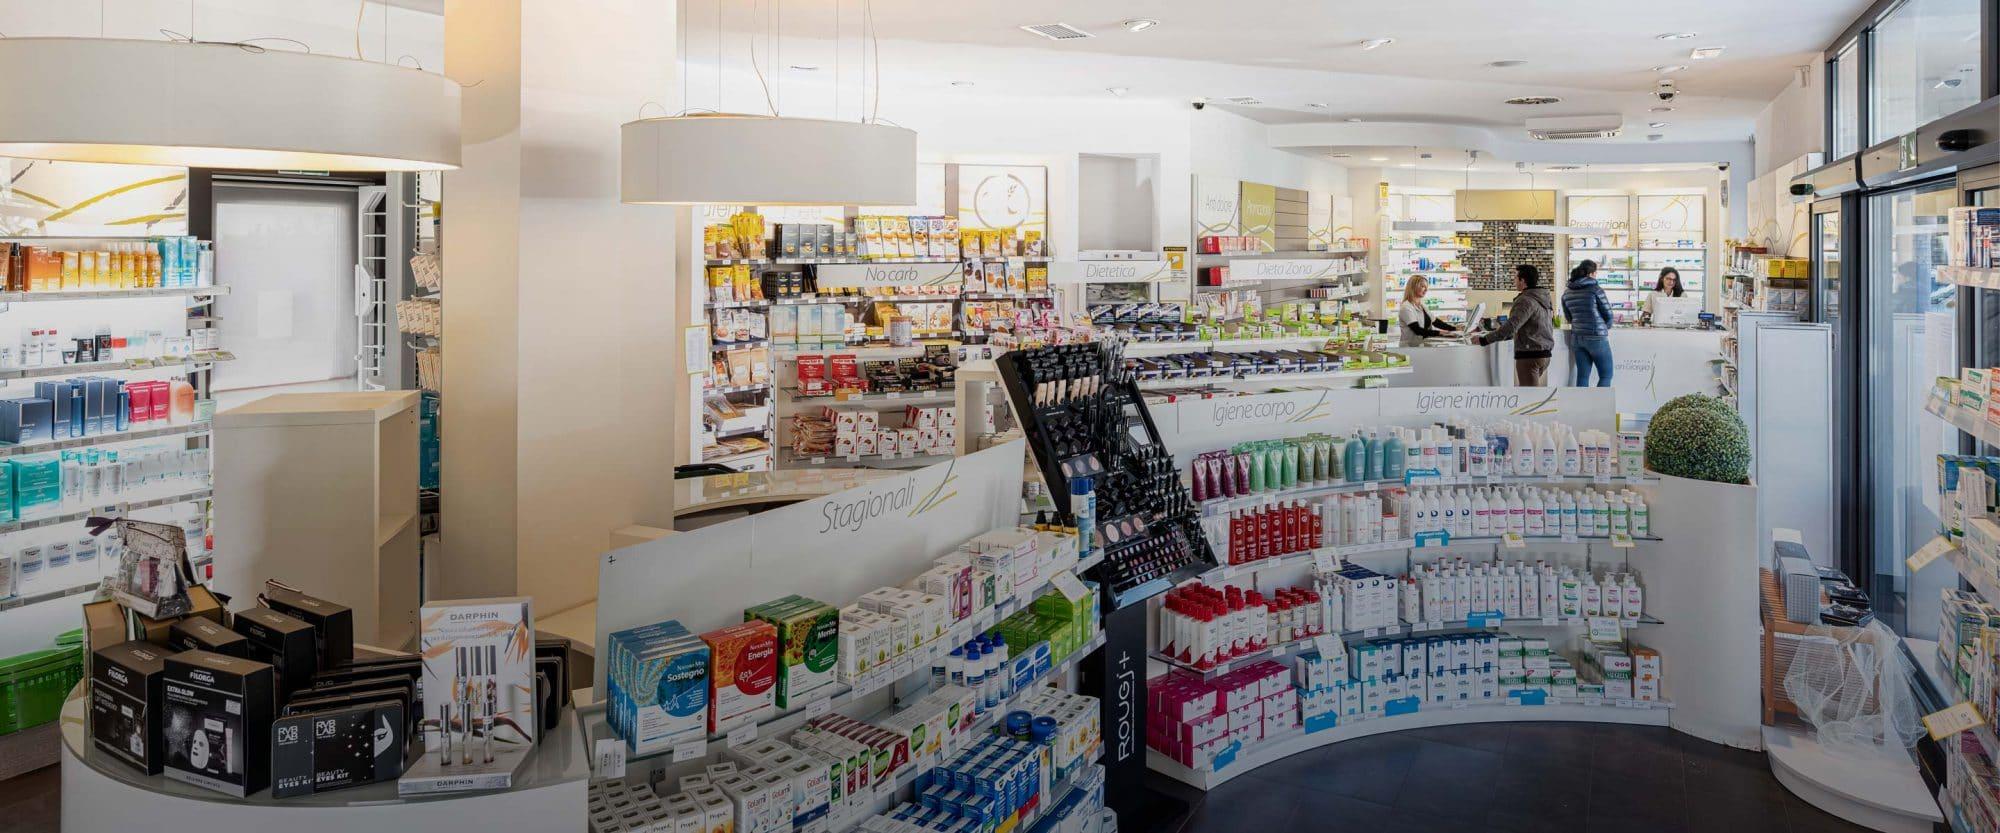 farmacia_san_giorgio_cover_